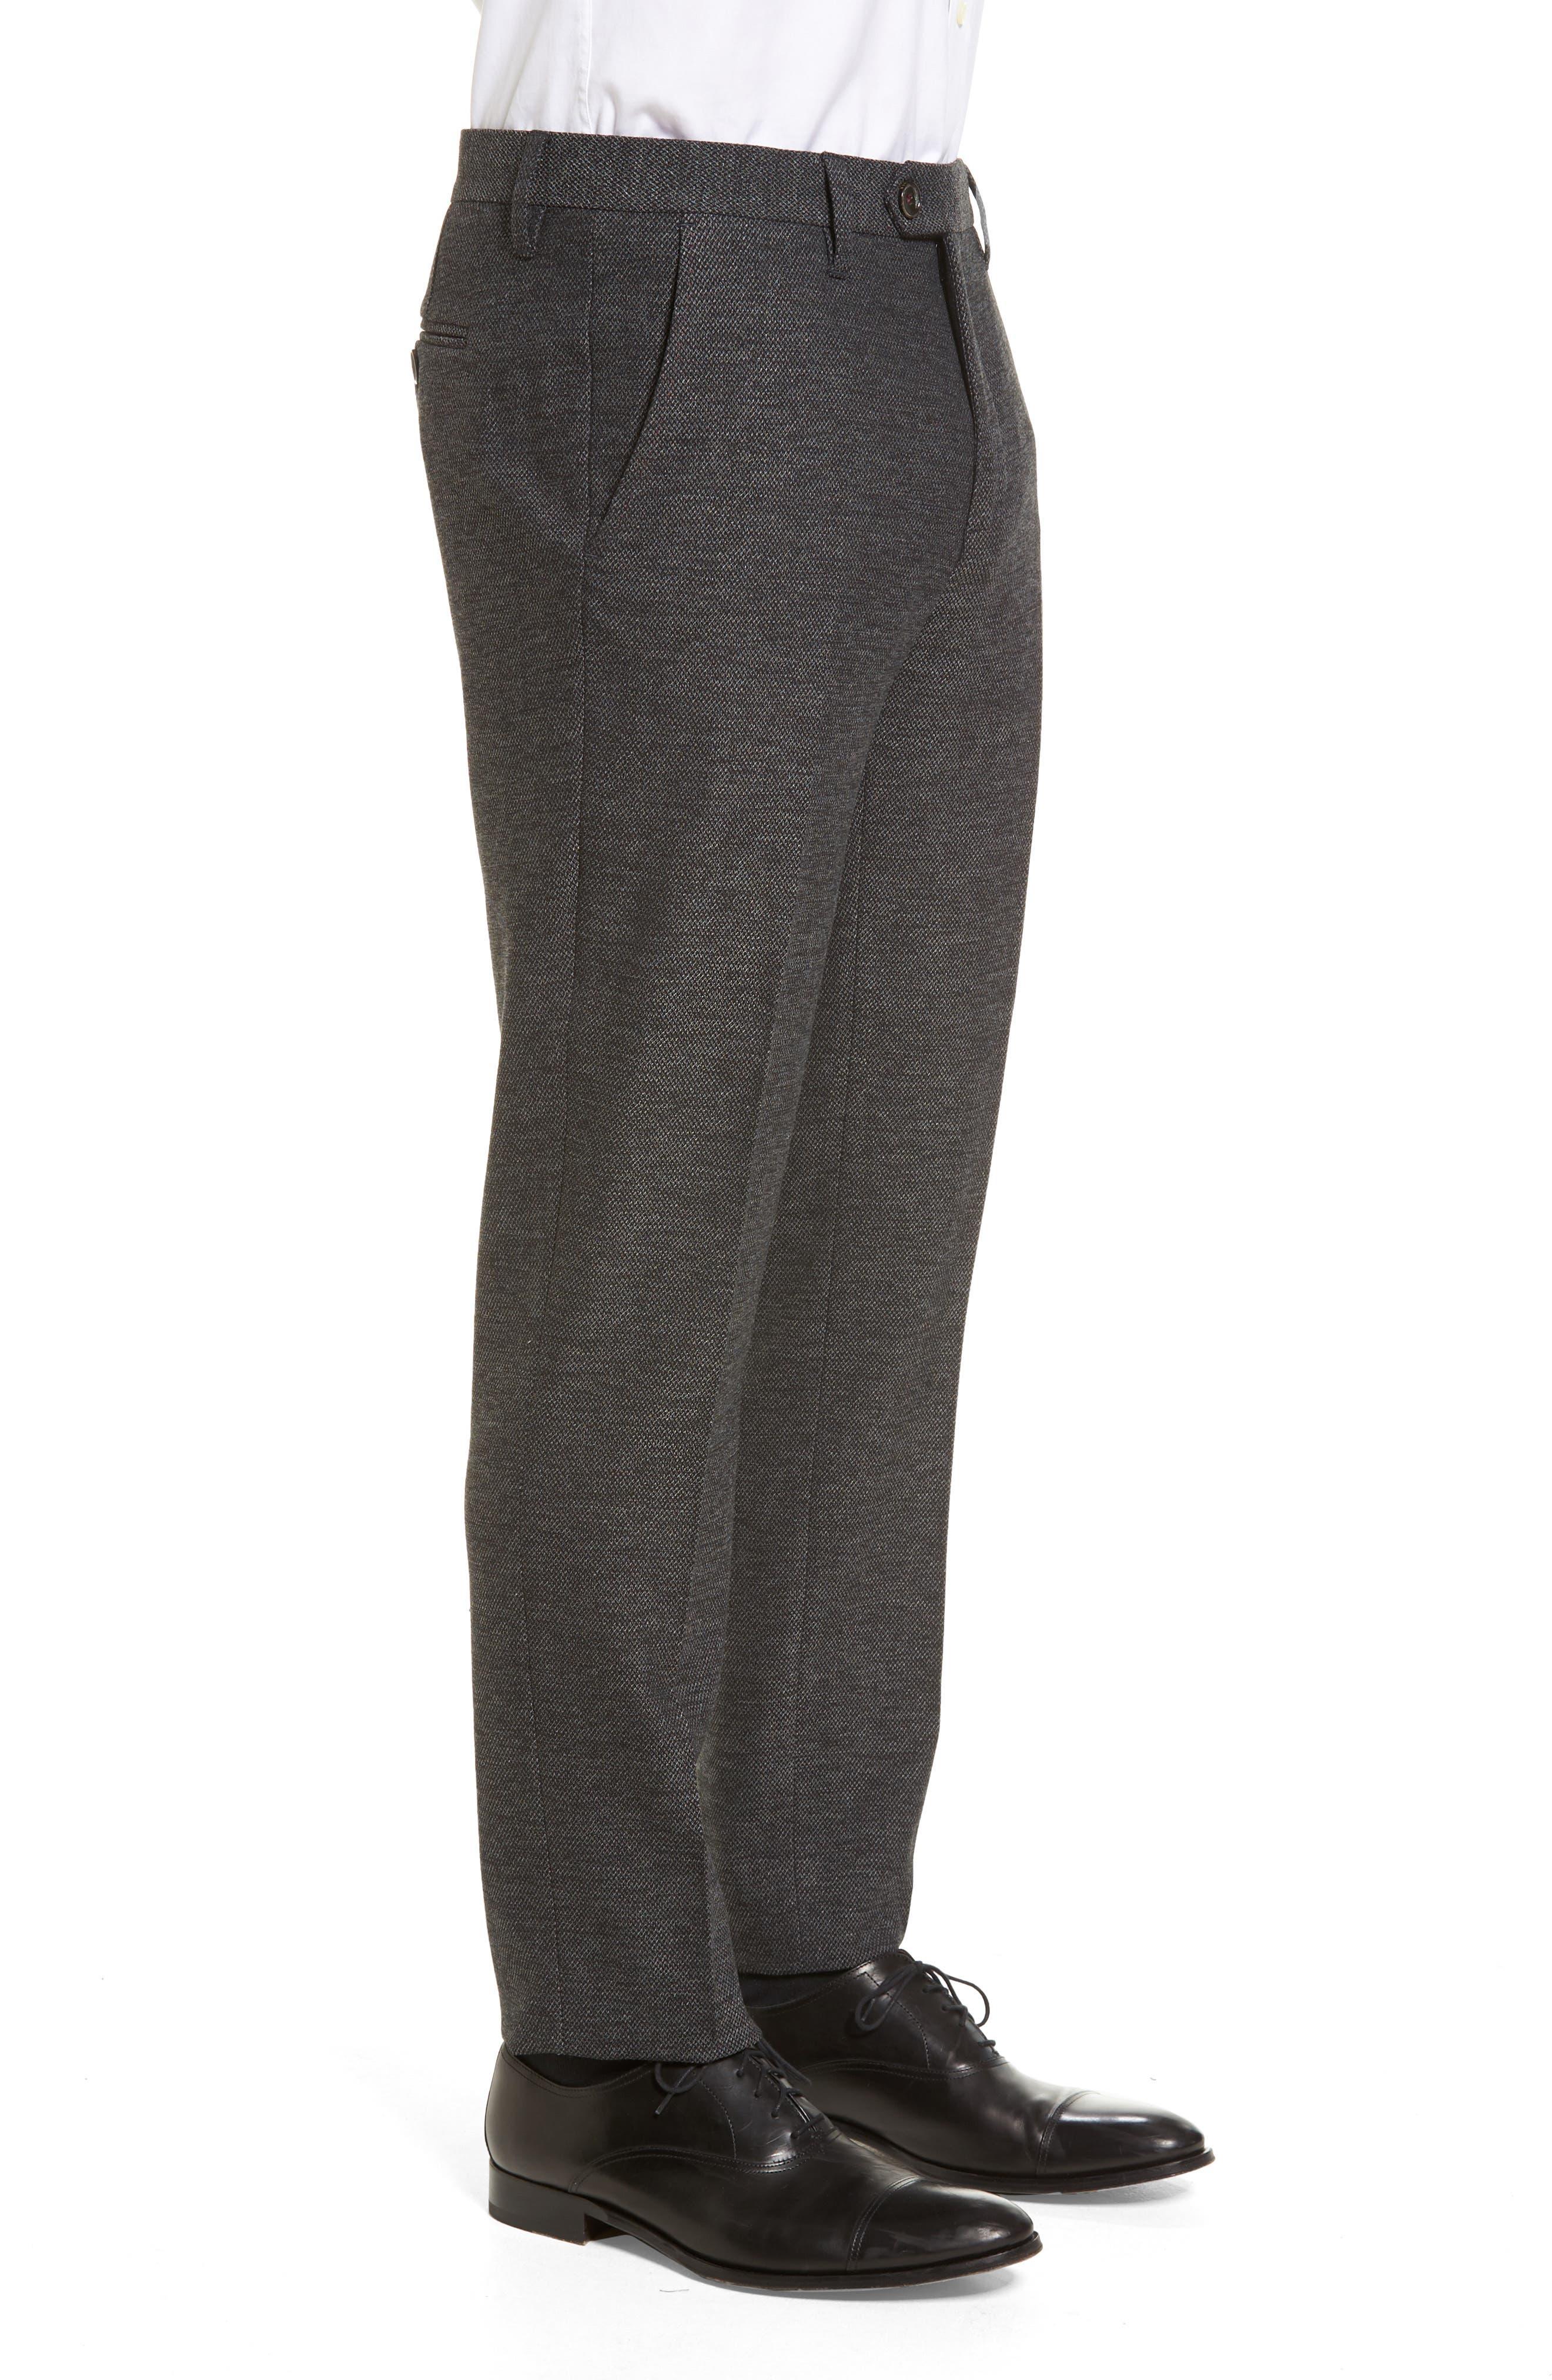 Porttro Modern Slim Fit Trousers,                             Alternate thumbnail 4, color,                             010